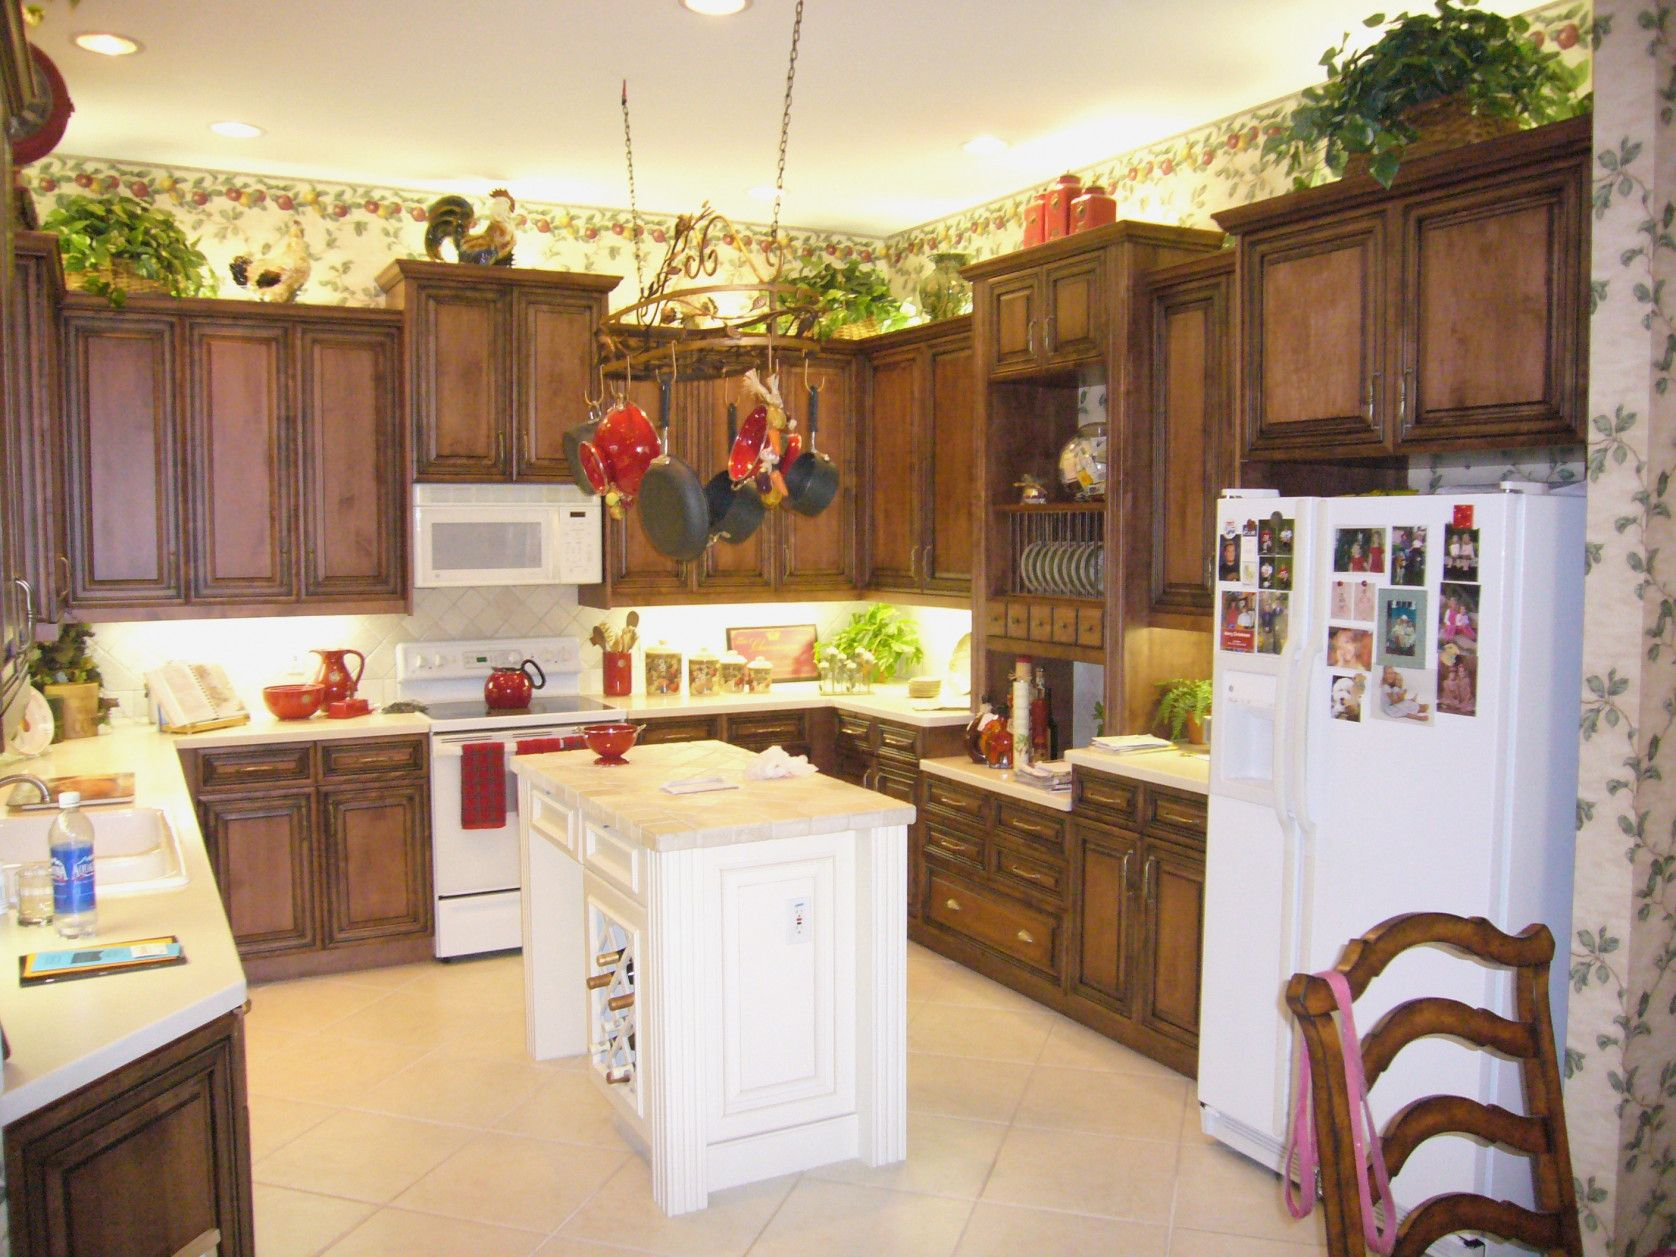 50+ Cabinet Refacing atlanta Ga - Remodeling Ideas for Kitchens ...